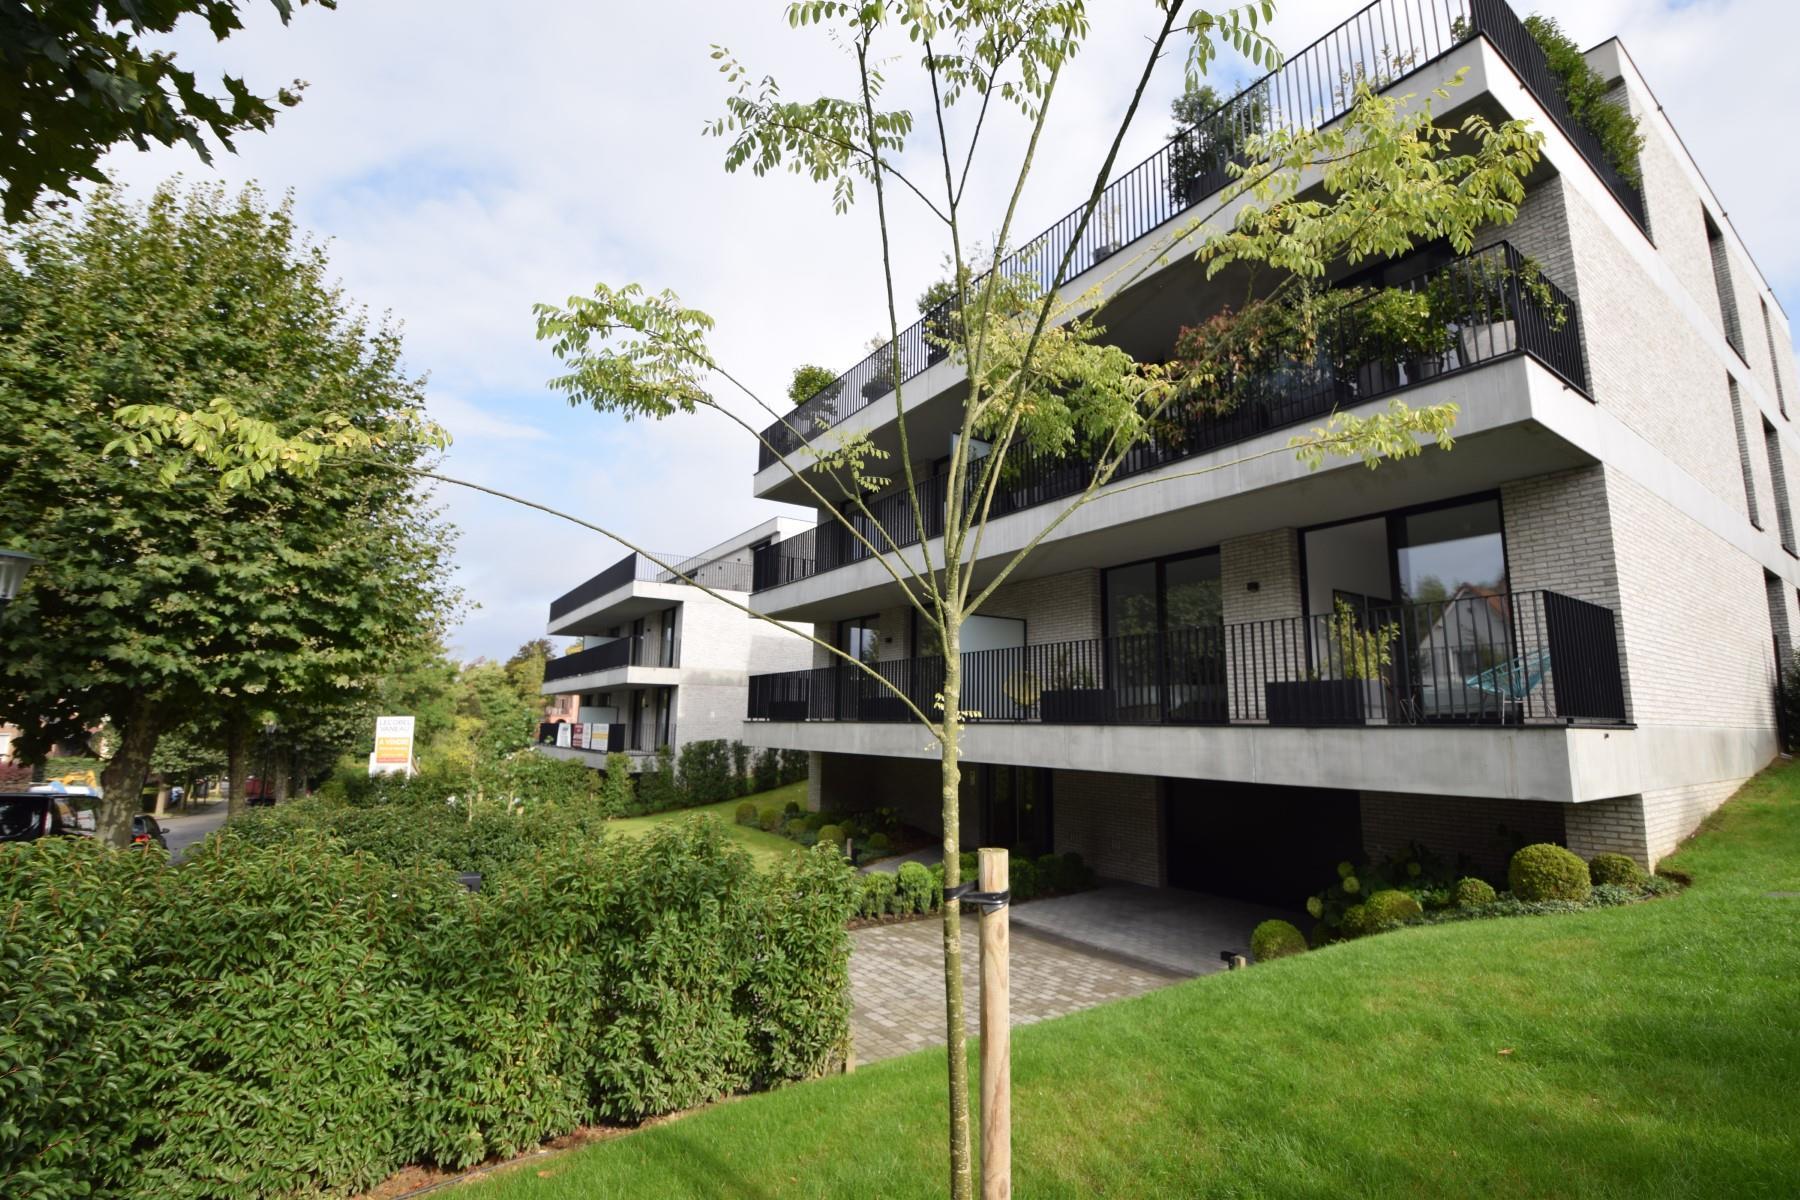 Appartement 3 chambres à Uccle